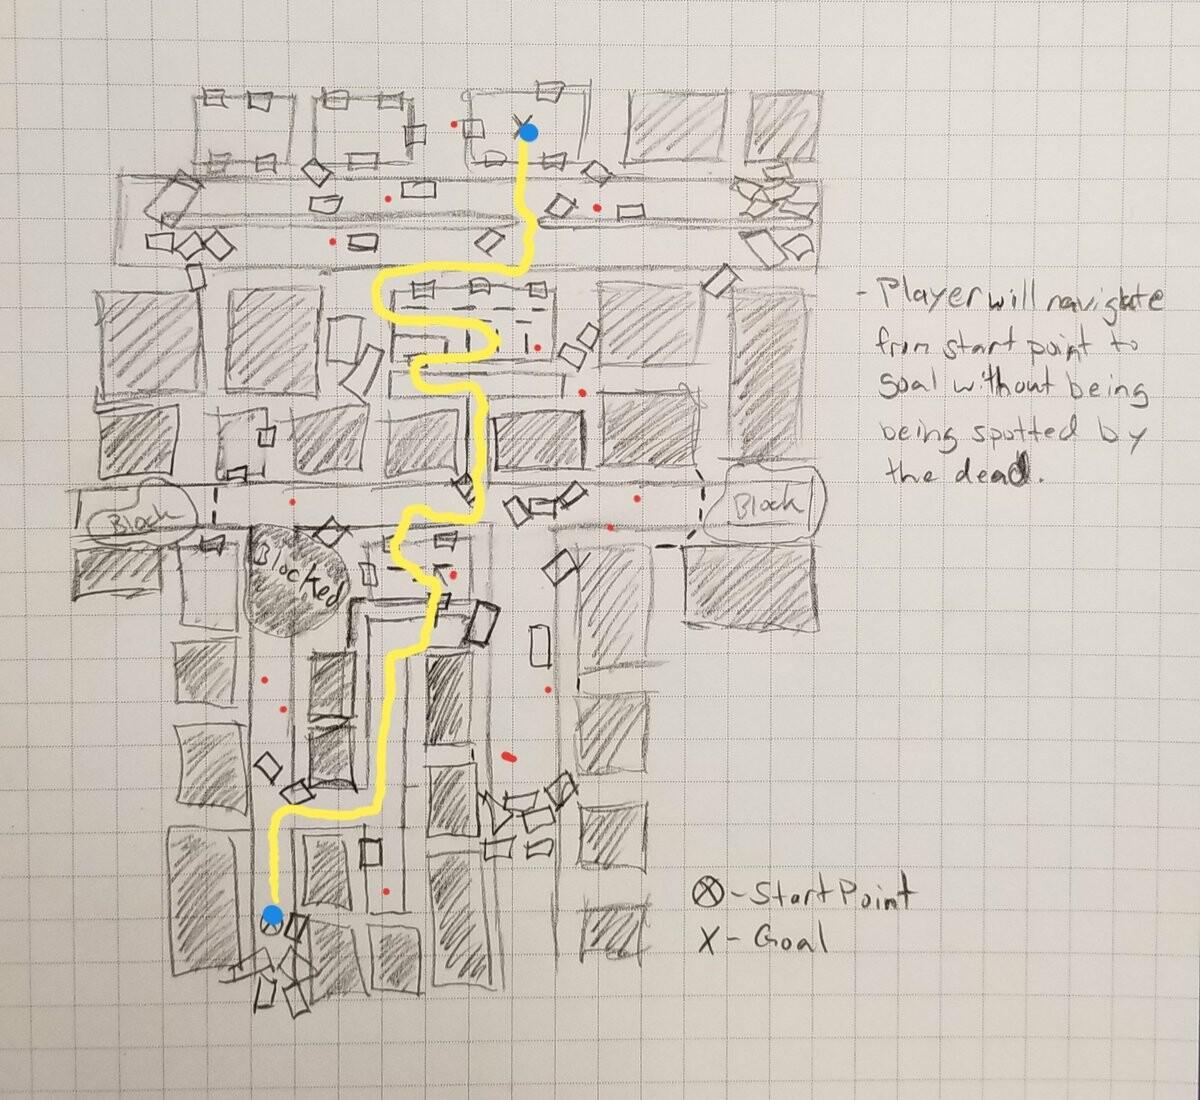 Chris Hodges | Level Designer - The Last of Us-Style Level